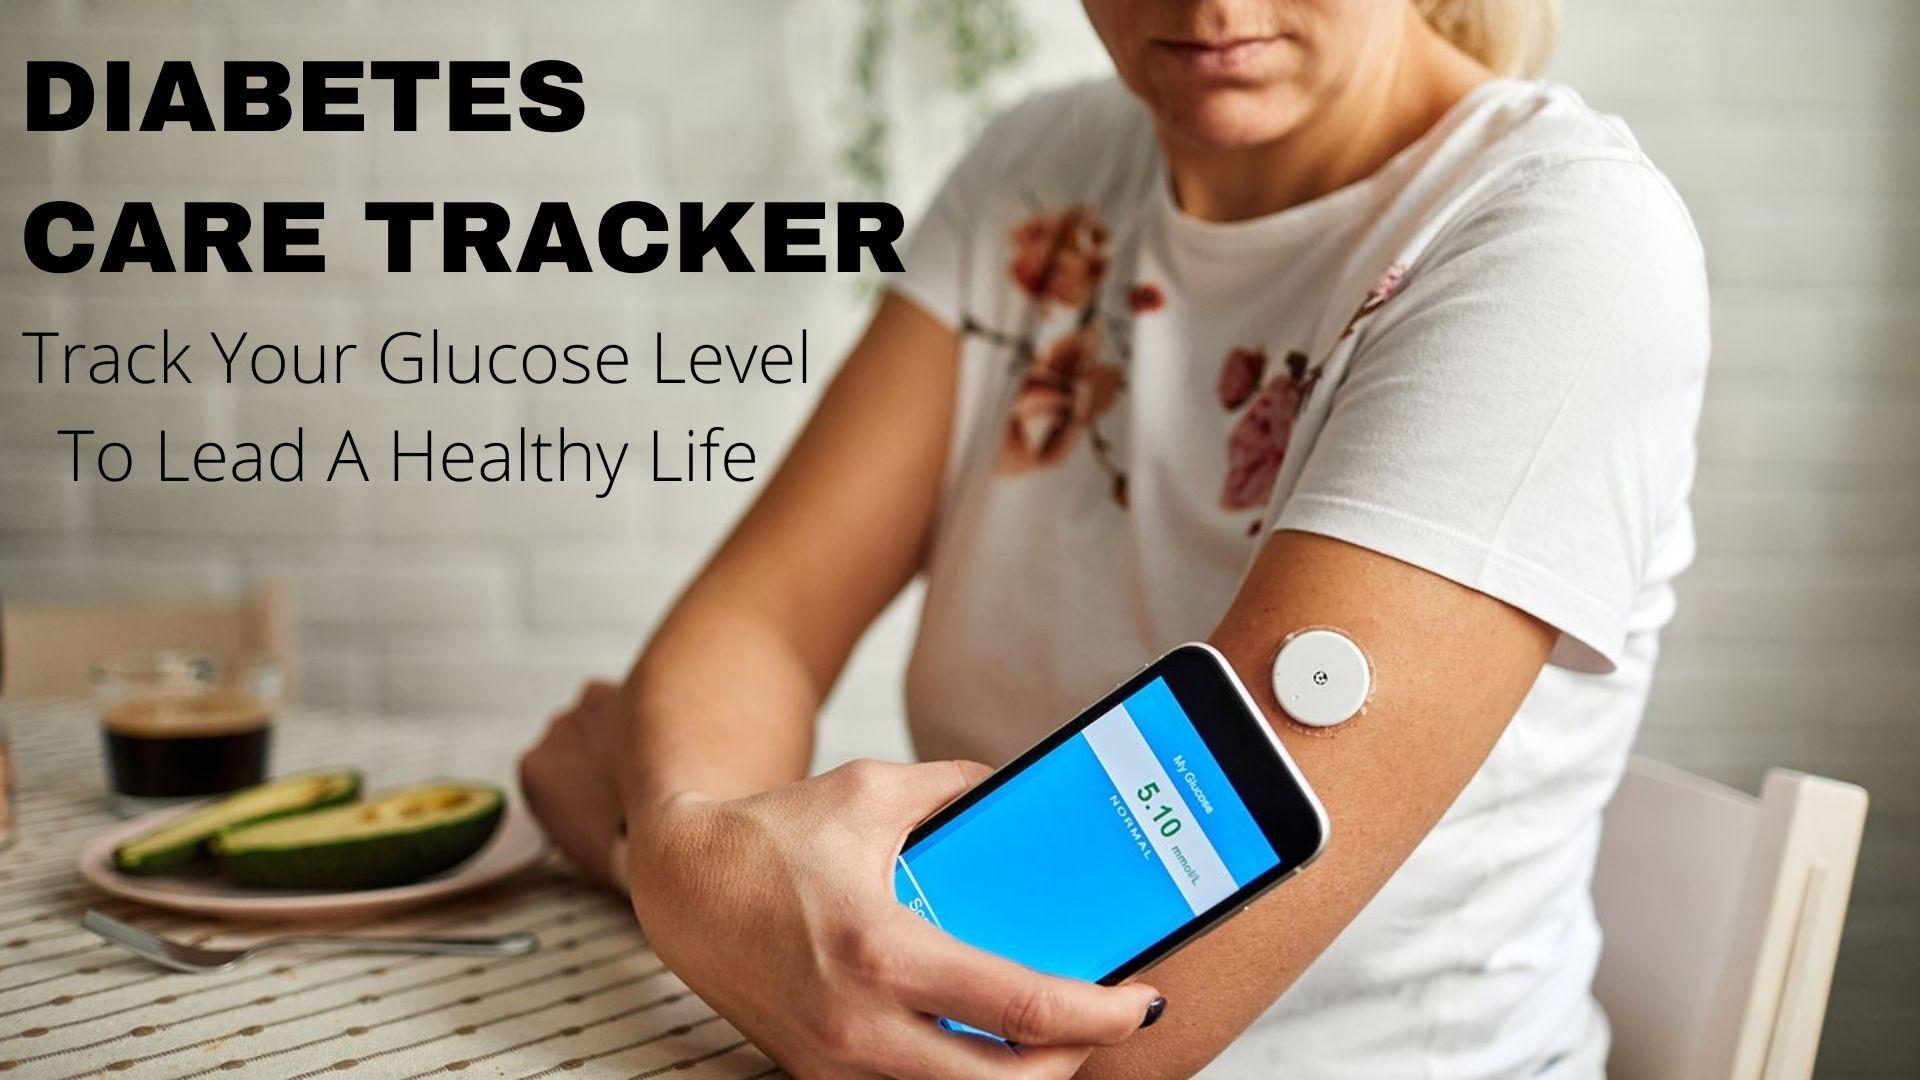 Diabetes Care Tracker